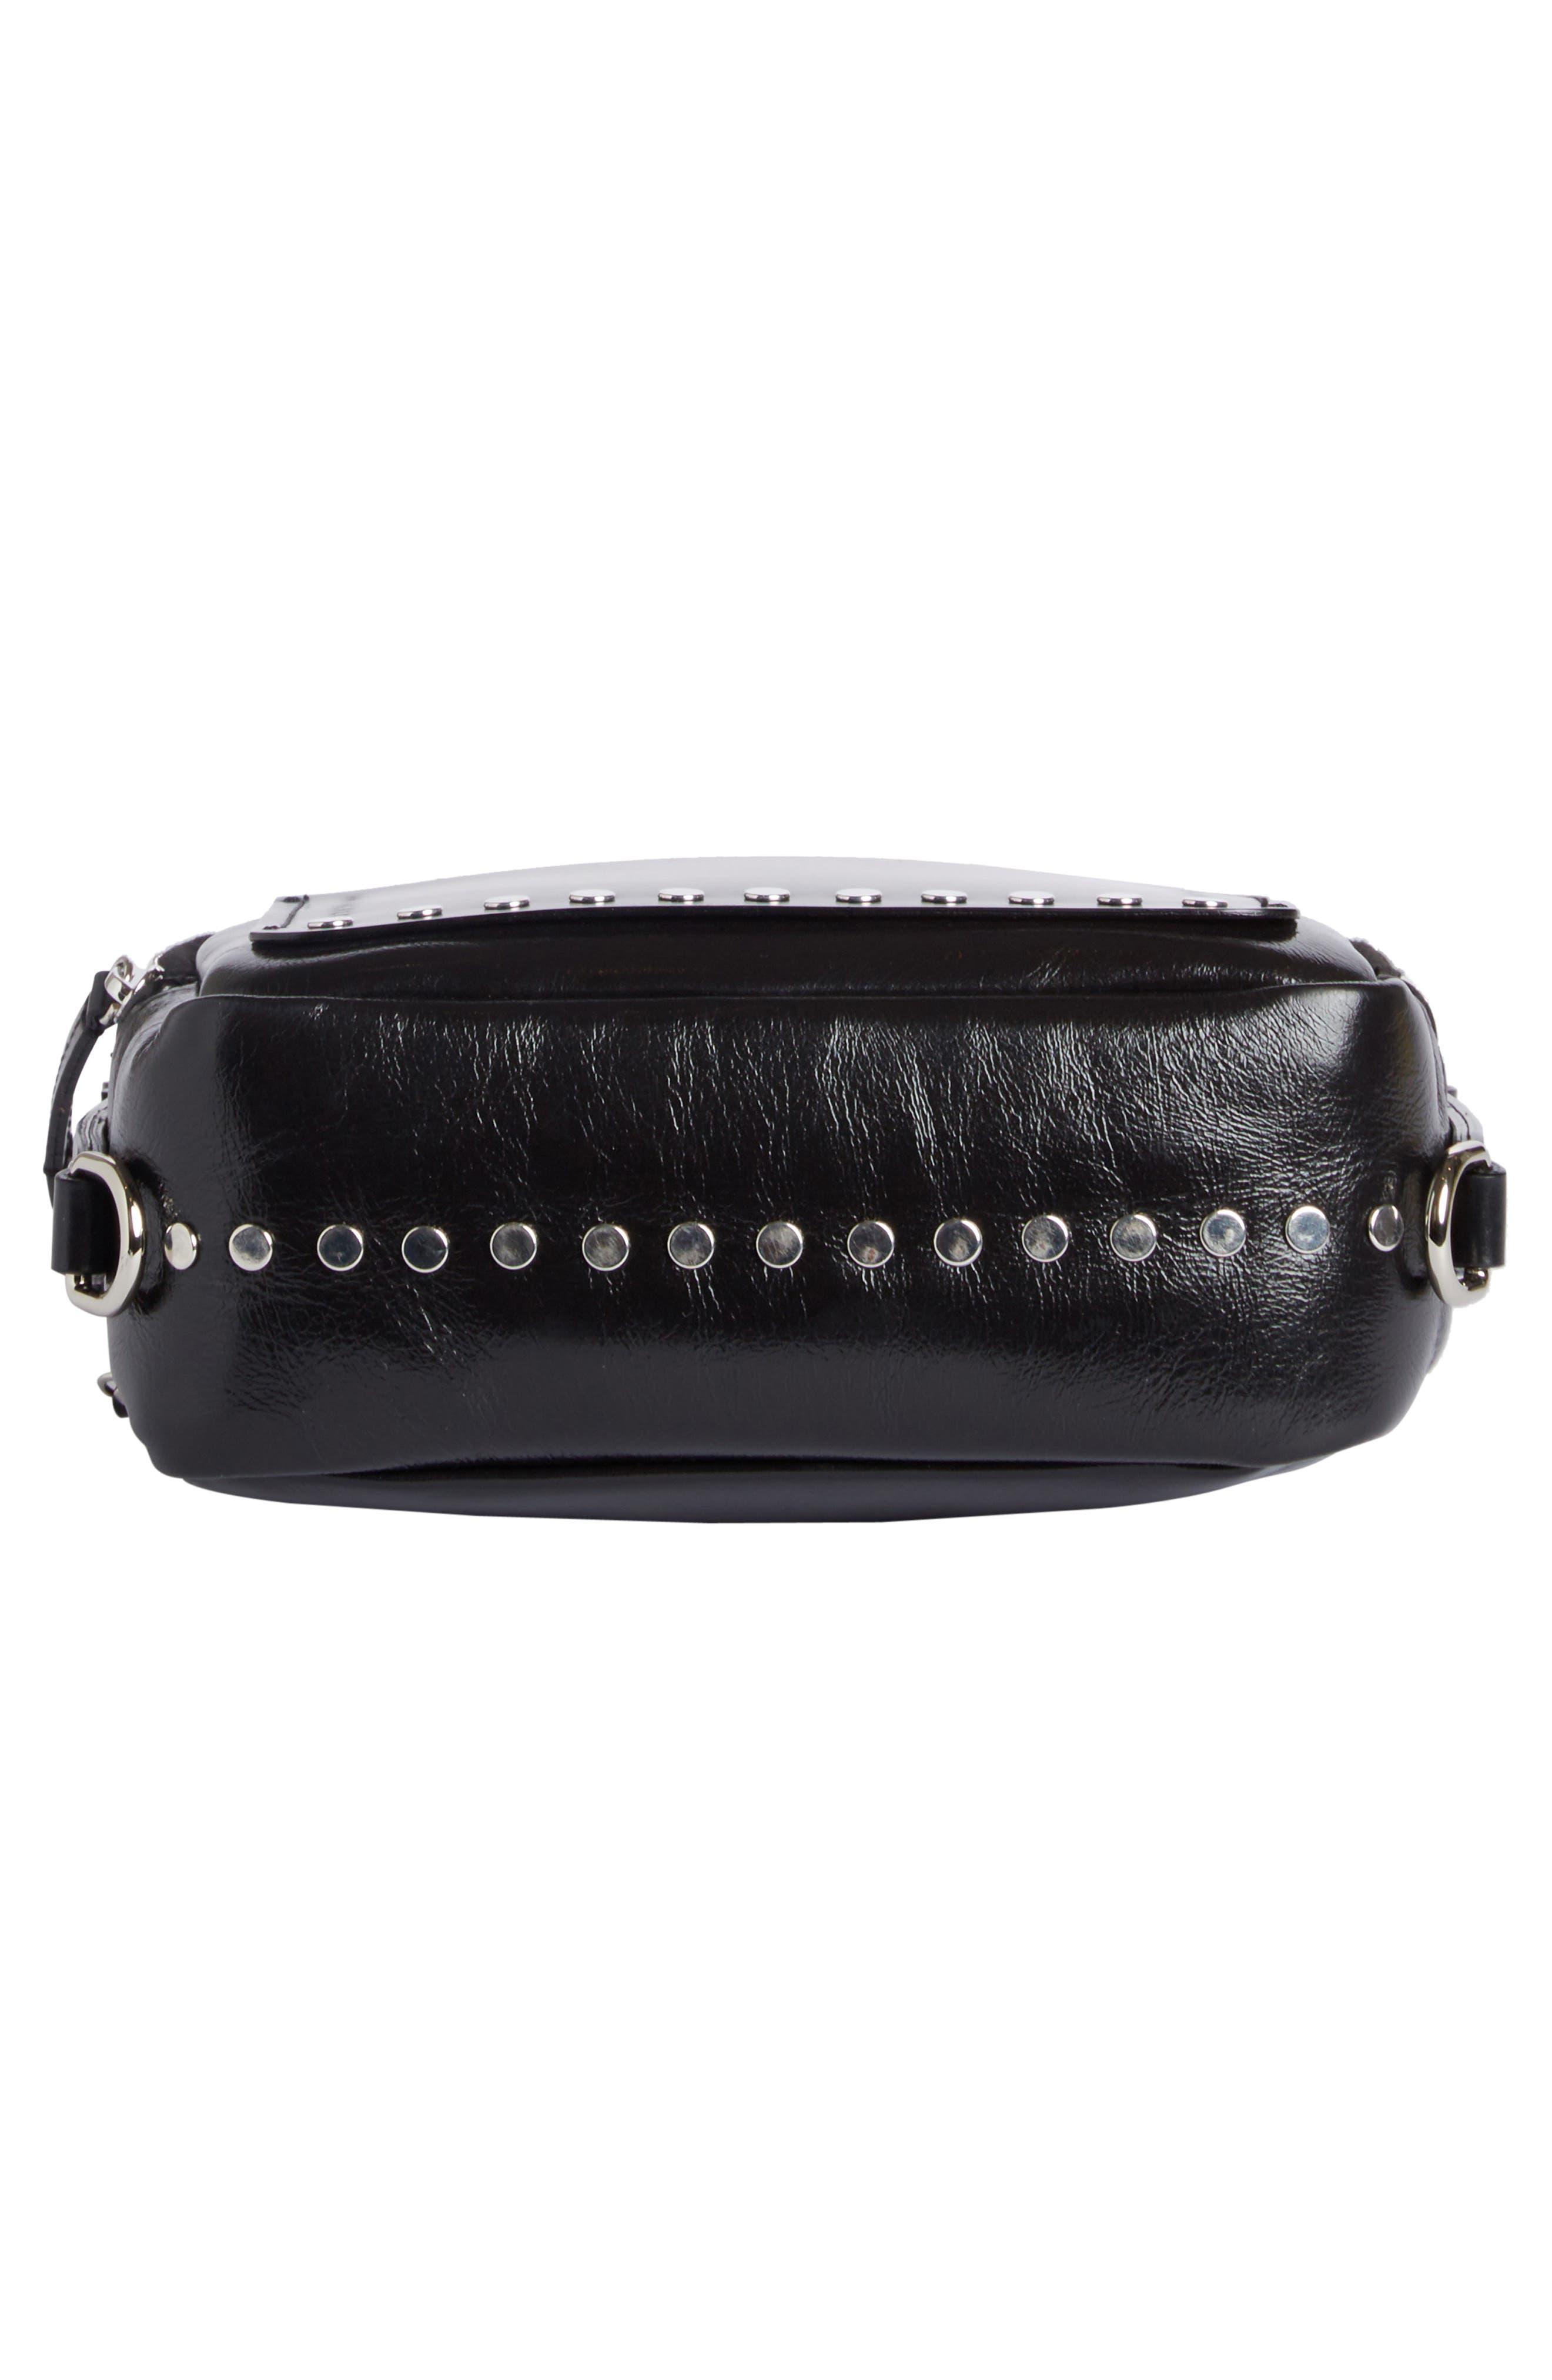 Tinley Studded Leather Crossbody Bag,                             Alternate thumbnail 4, color,                             003